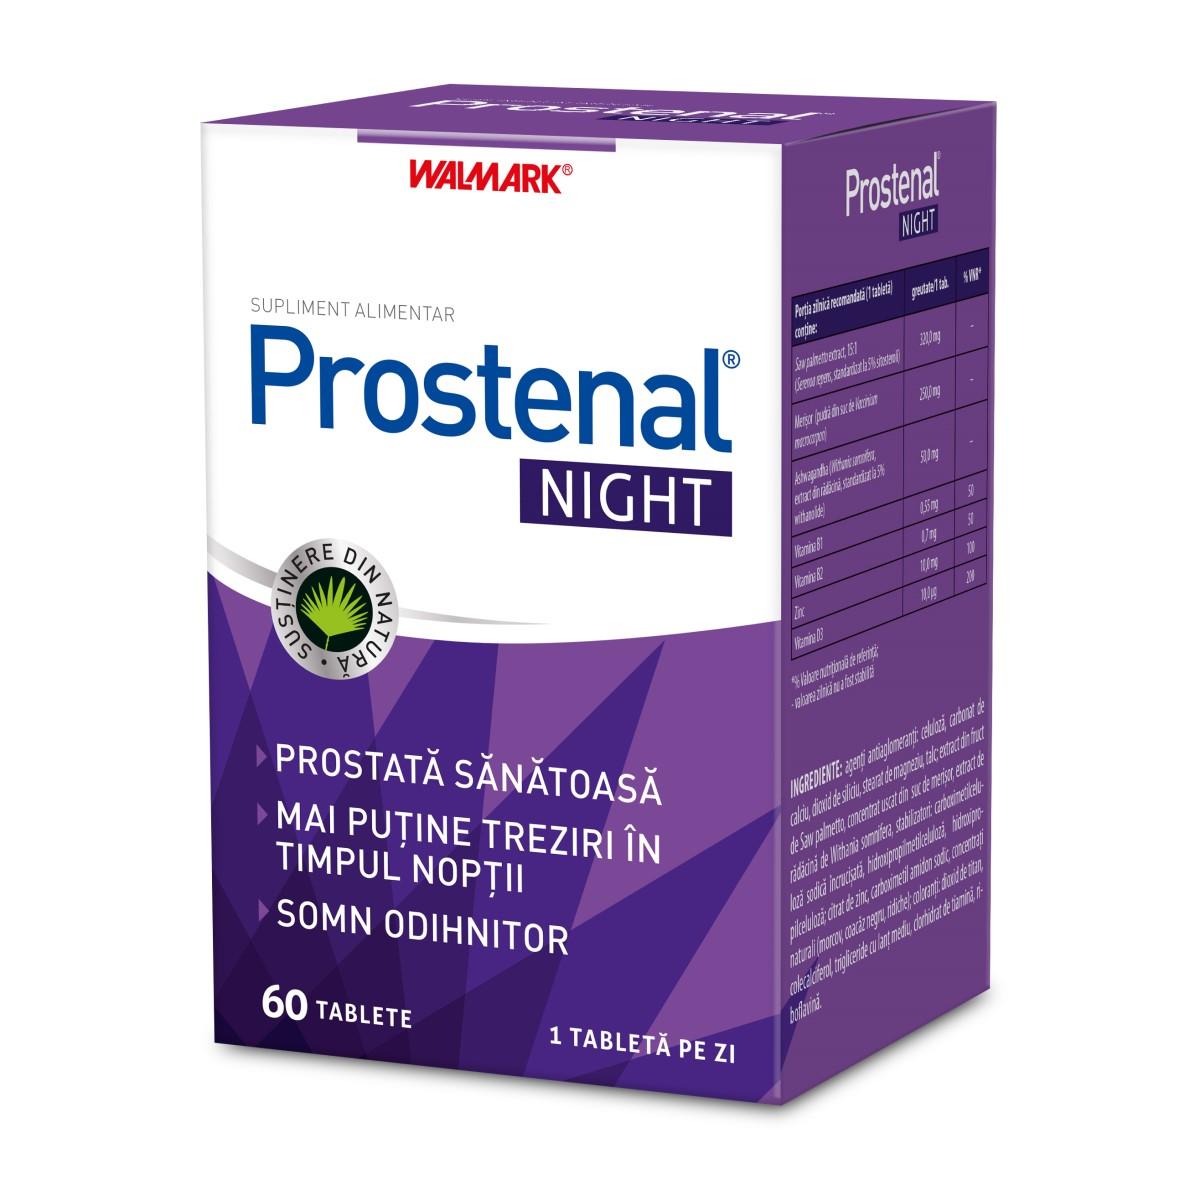 Prostenal Night, 60 tablete, Walmark